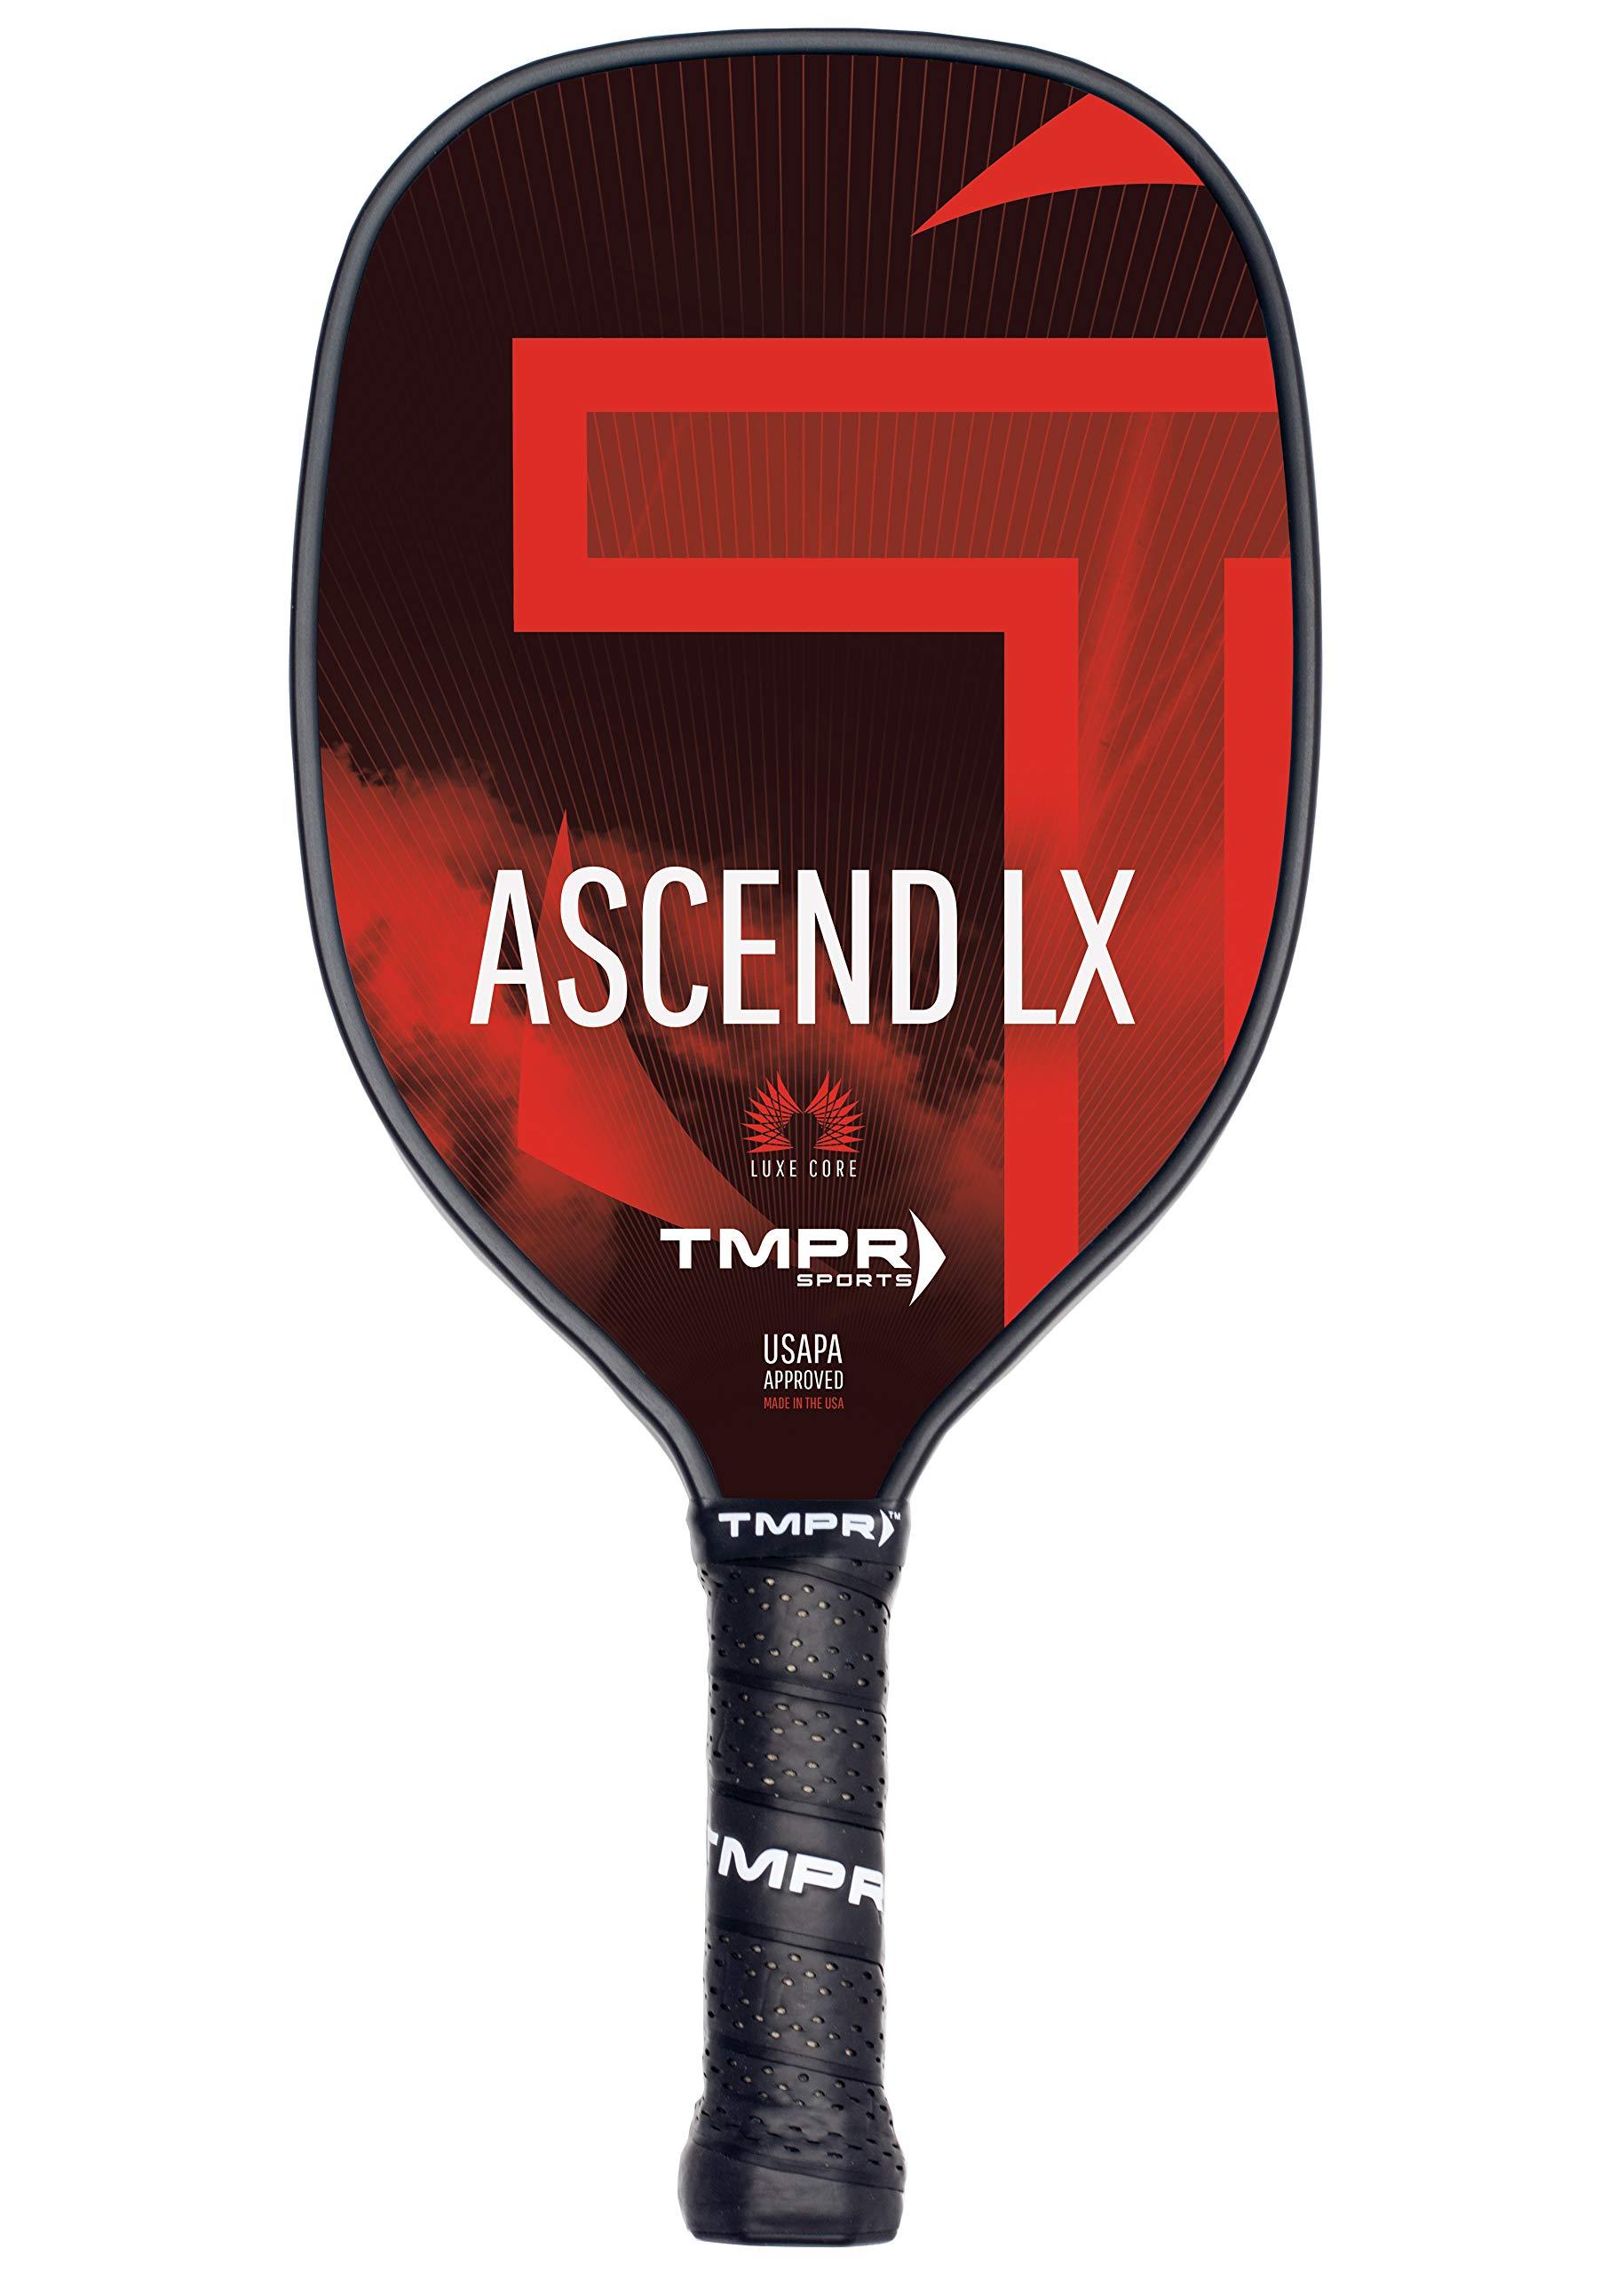 TMPR Sports > Ascend LX > Honeycomb Polymer Pickleball -DQ66